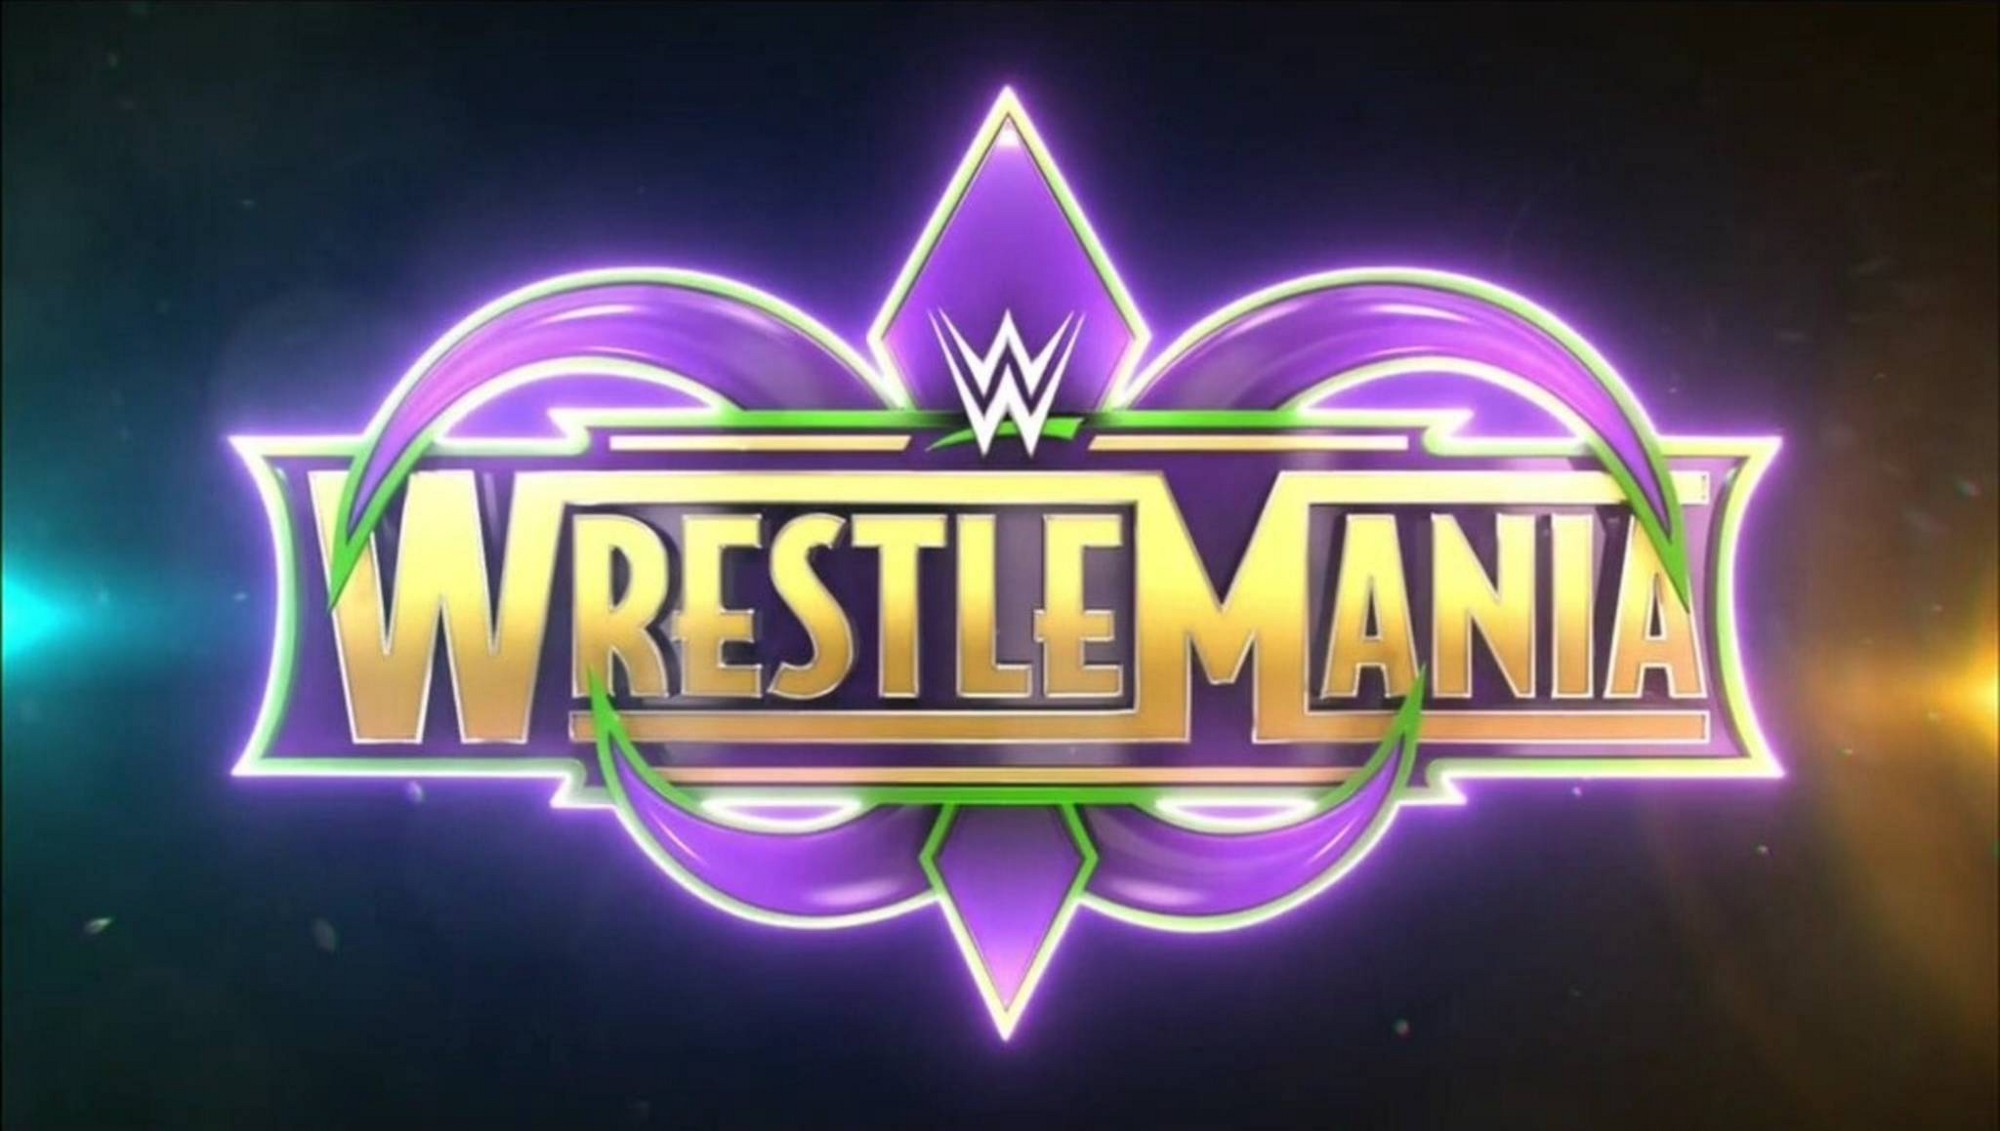 Wrestlemania 34 WWE